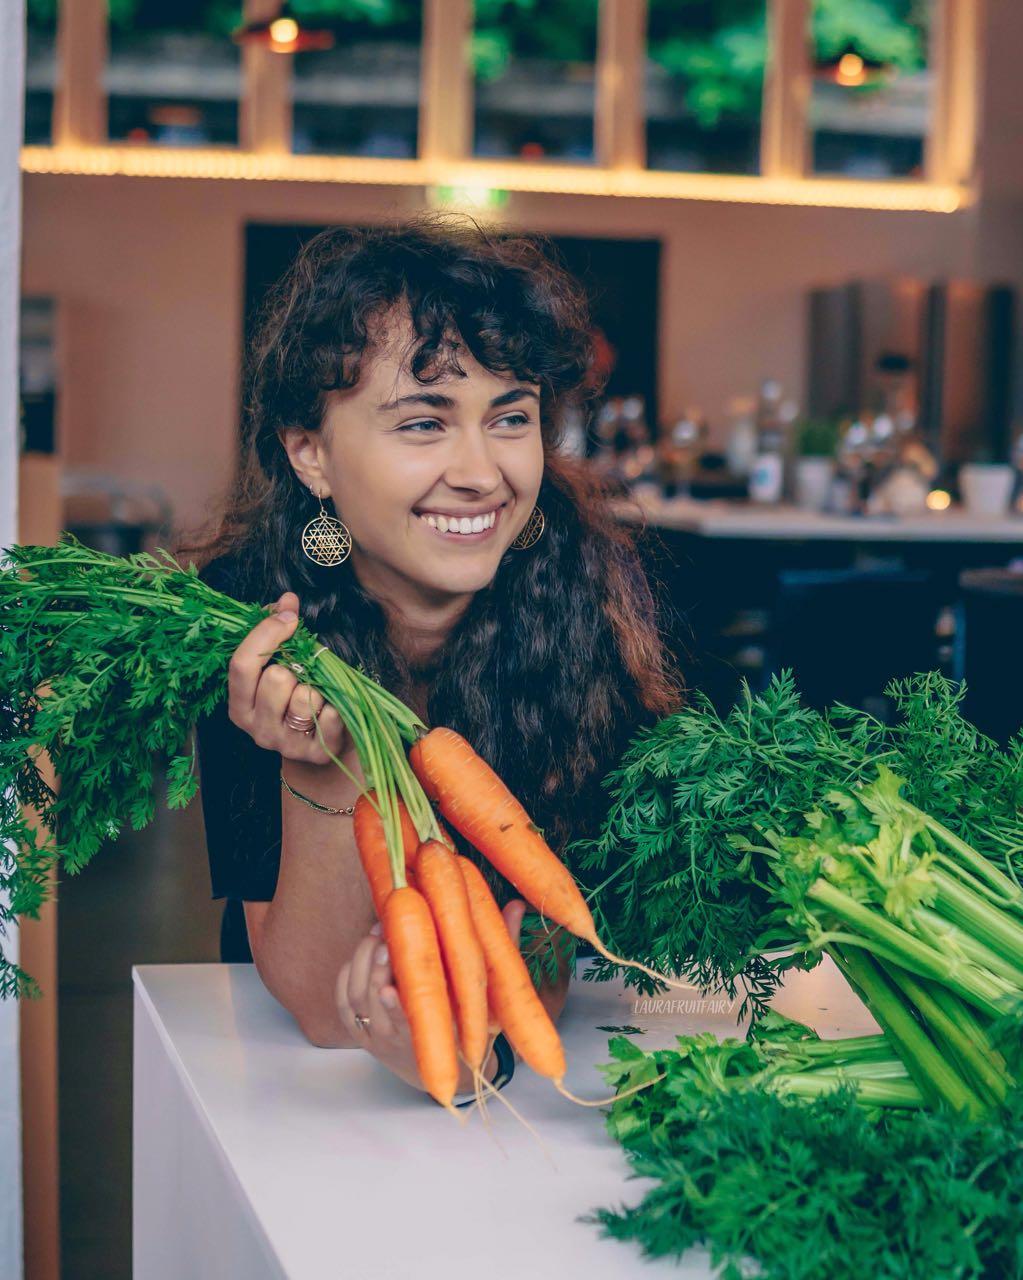 Laura Fruitfairy Back to Balance 2018 Healthylifebalance